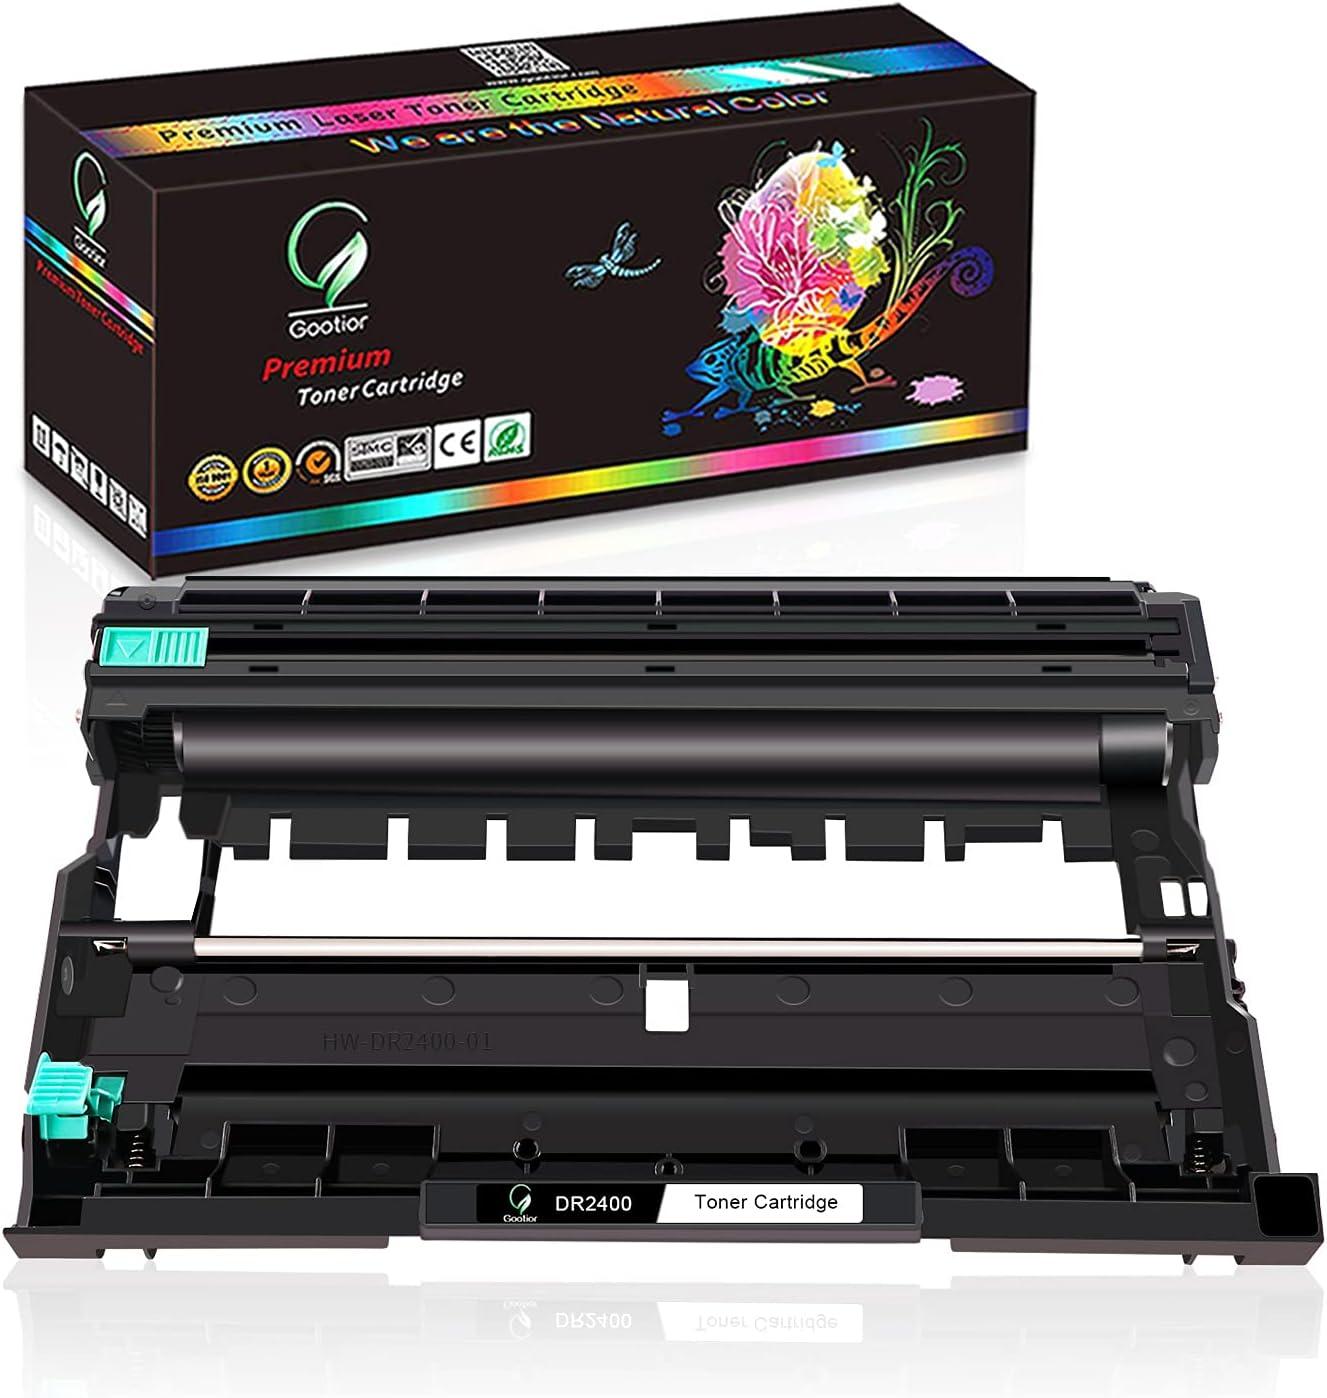 Gootior DR2400 DR-2400 Tambor Compatible para Brother TN2420 para Brother HL-L2310D HL-L2350DN HL-L2370DN HL-L2375DW DCP-L2510D DCP-L2530DW MFC-L2710DN MFC-L2730DW MFC-L2750DW, No tóner